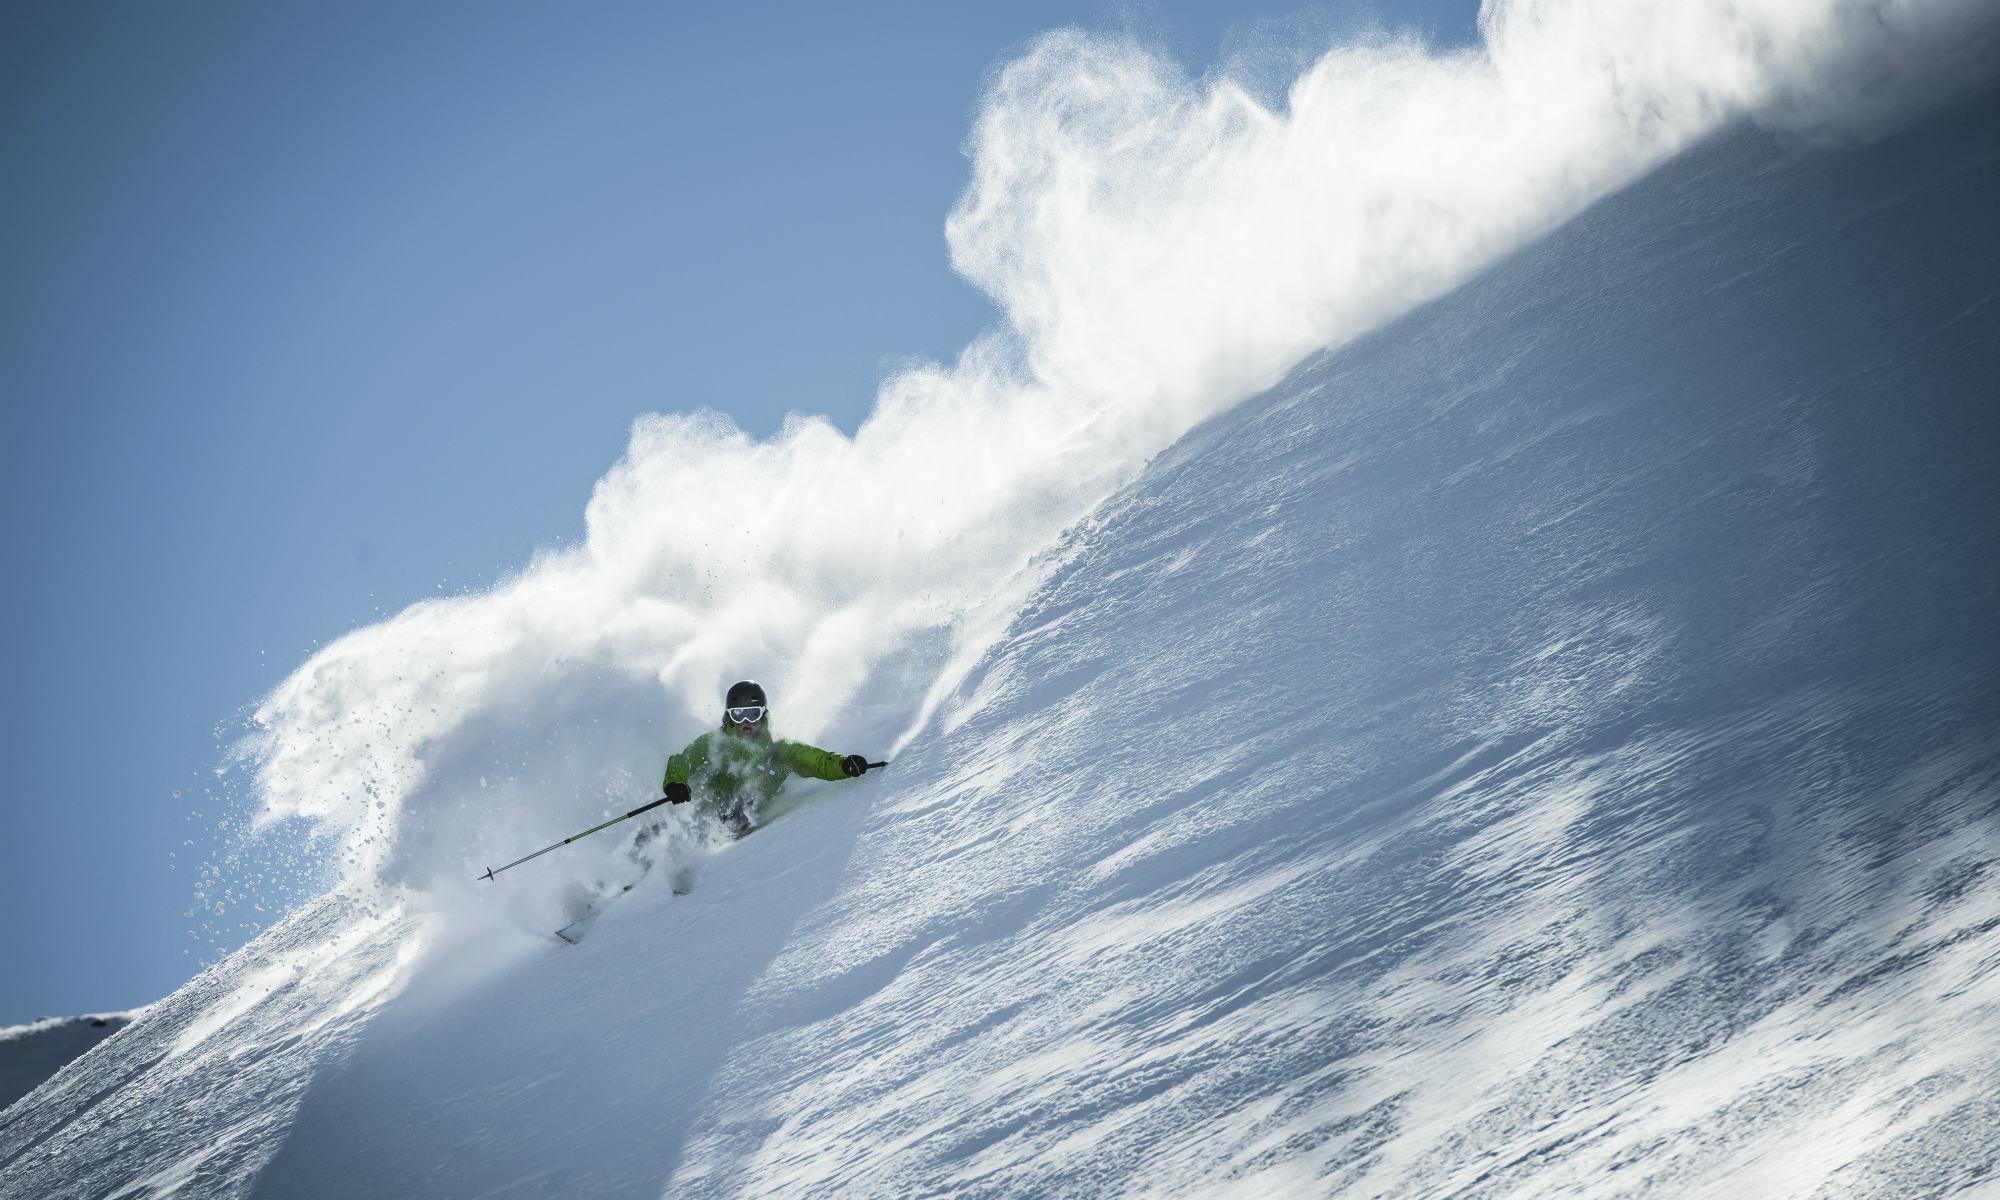 A deep snow skier gliding through the fresh powder snow.